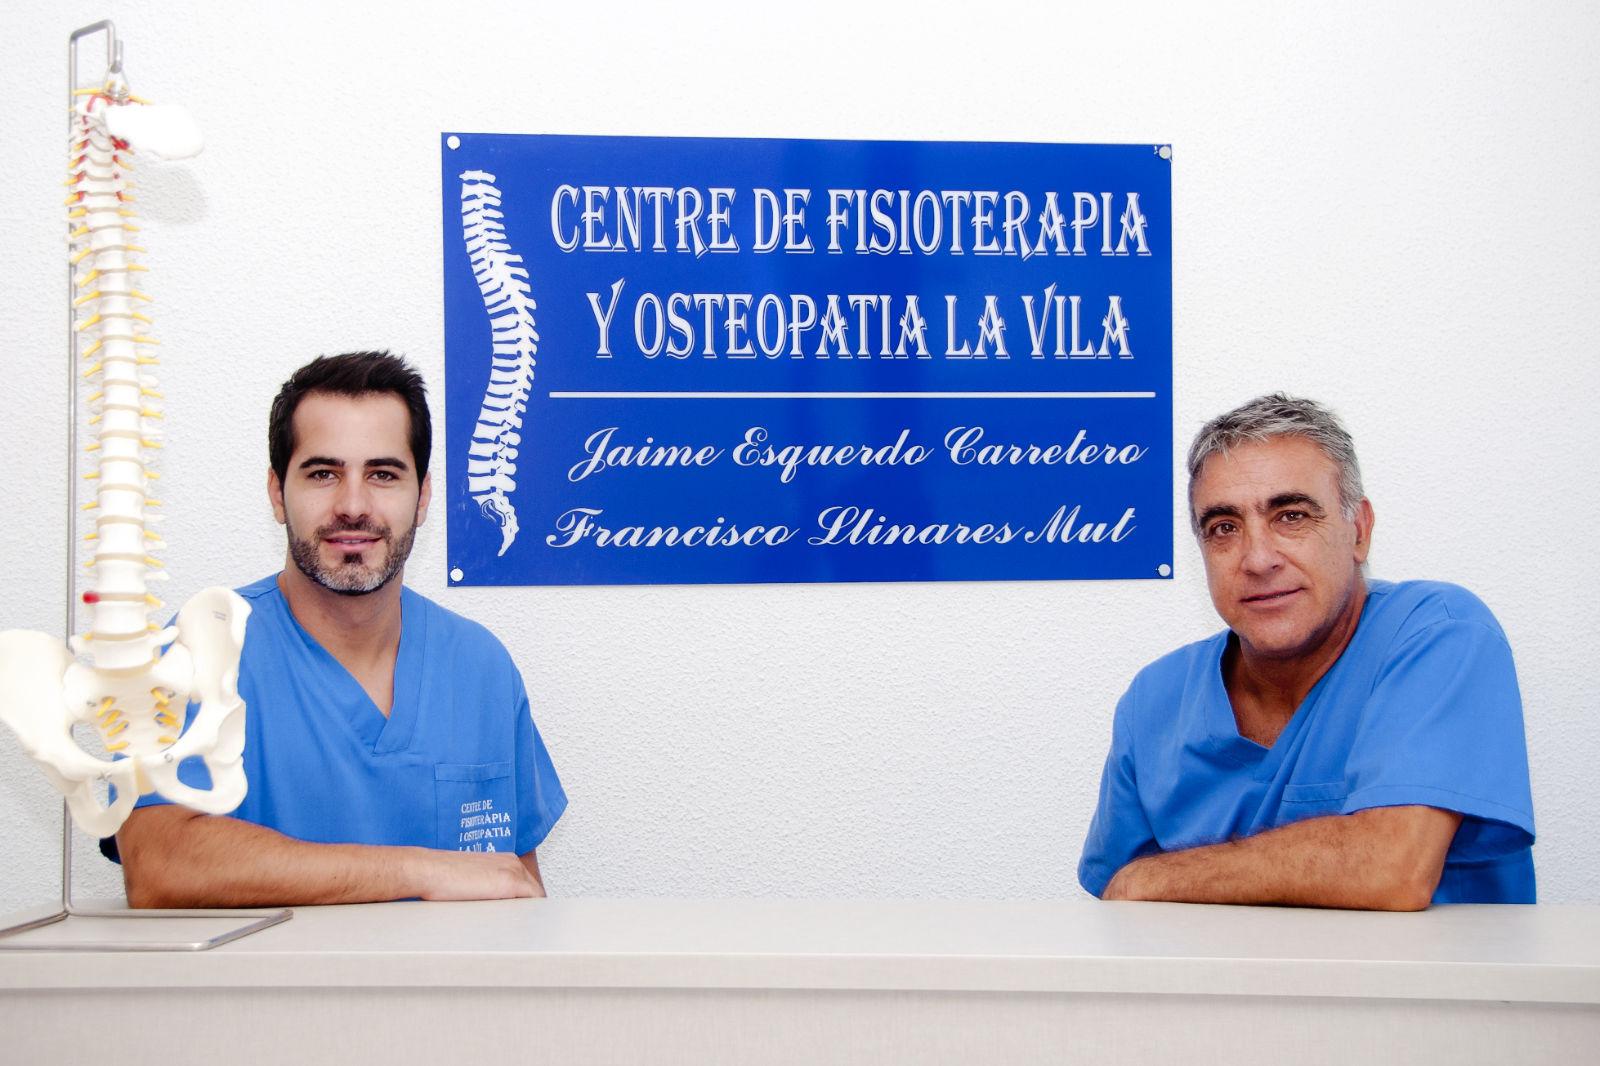 Centro de Fisioterapia y Osteopatía Villajoyosa